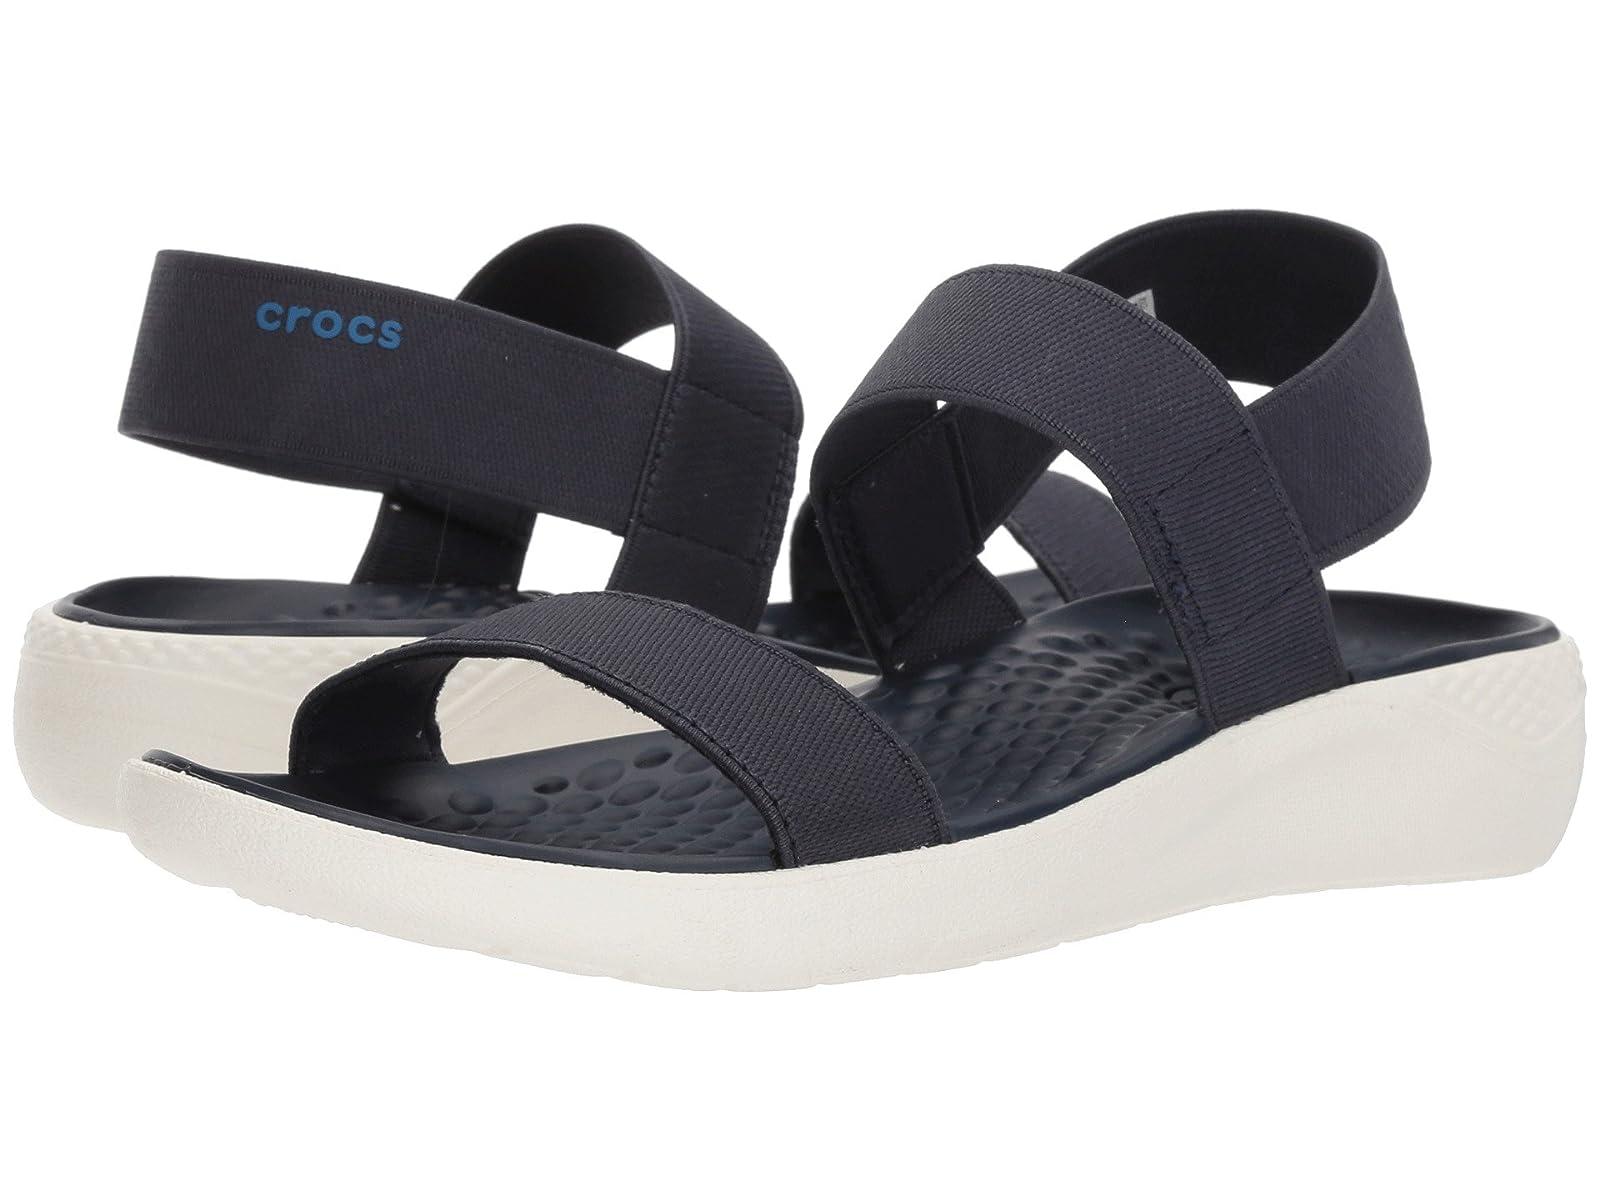 Crocs LiteRide SandalComfortable and distinctive shoes